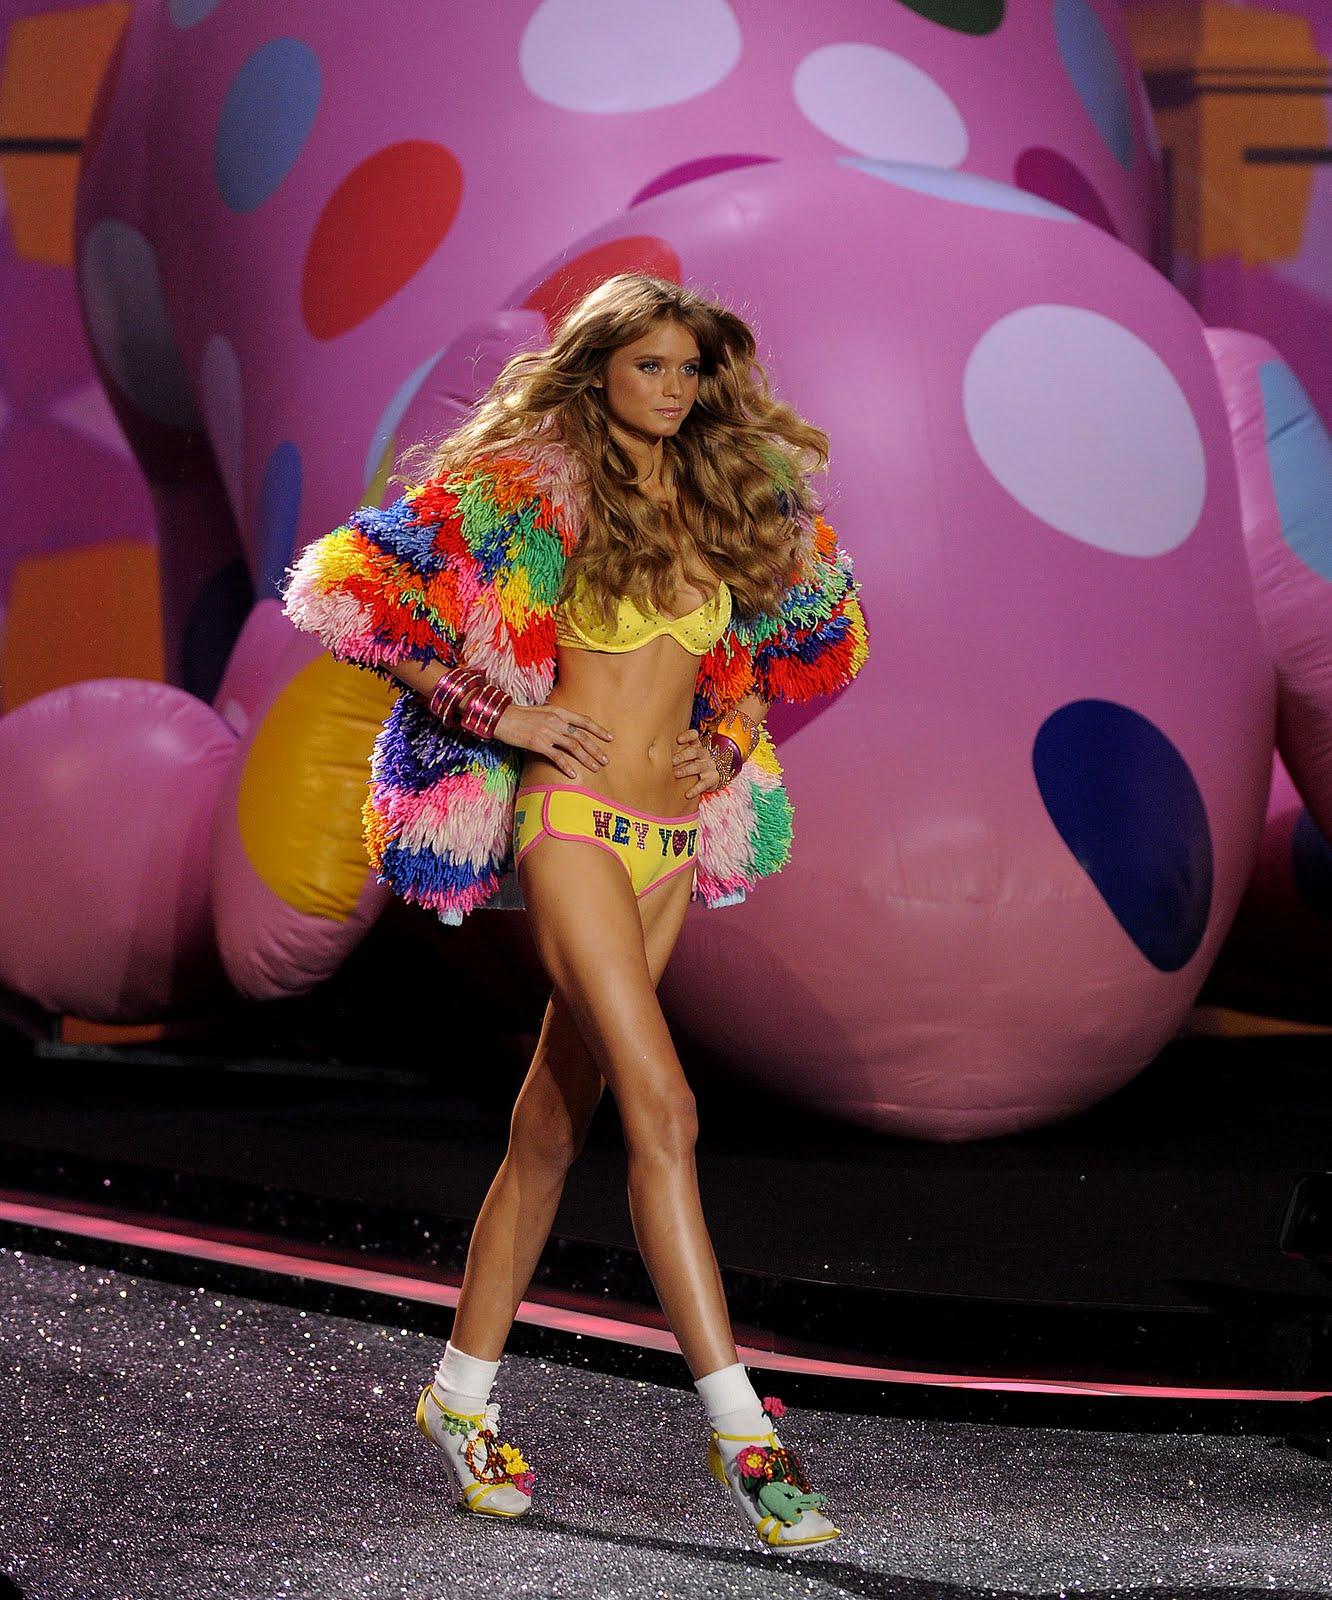 http://3.bp.blogspot.com/_TL3kwXYIJaI/SwhOmjIeynI/AAAAAAAADdE/JrSeE_ShmRk/s1600/The+2009+Victoria%27s+Secret+Fashion+Show+029.jpg